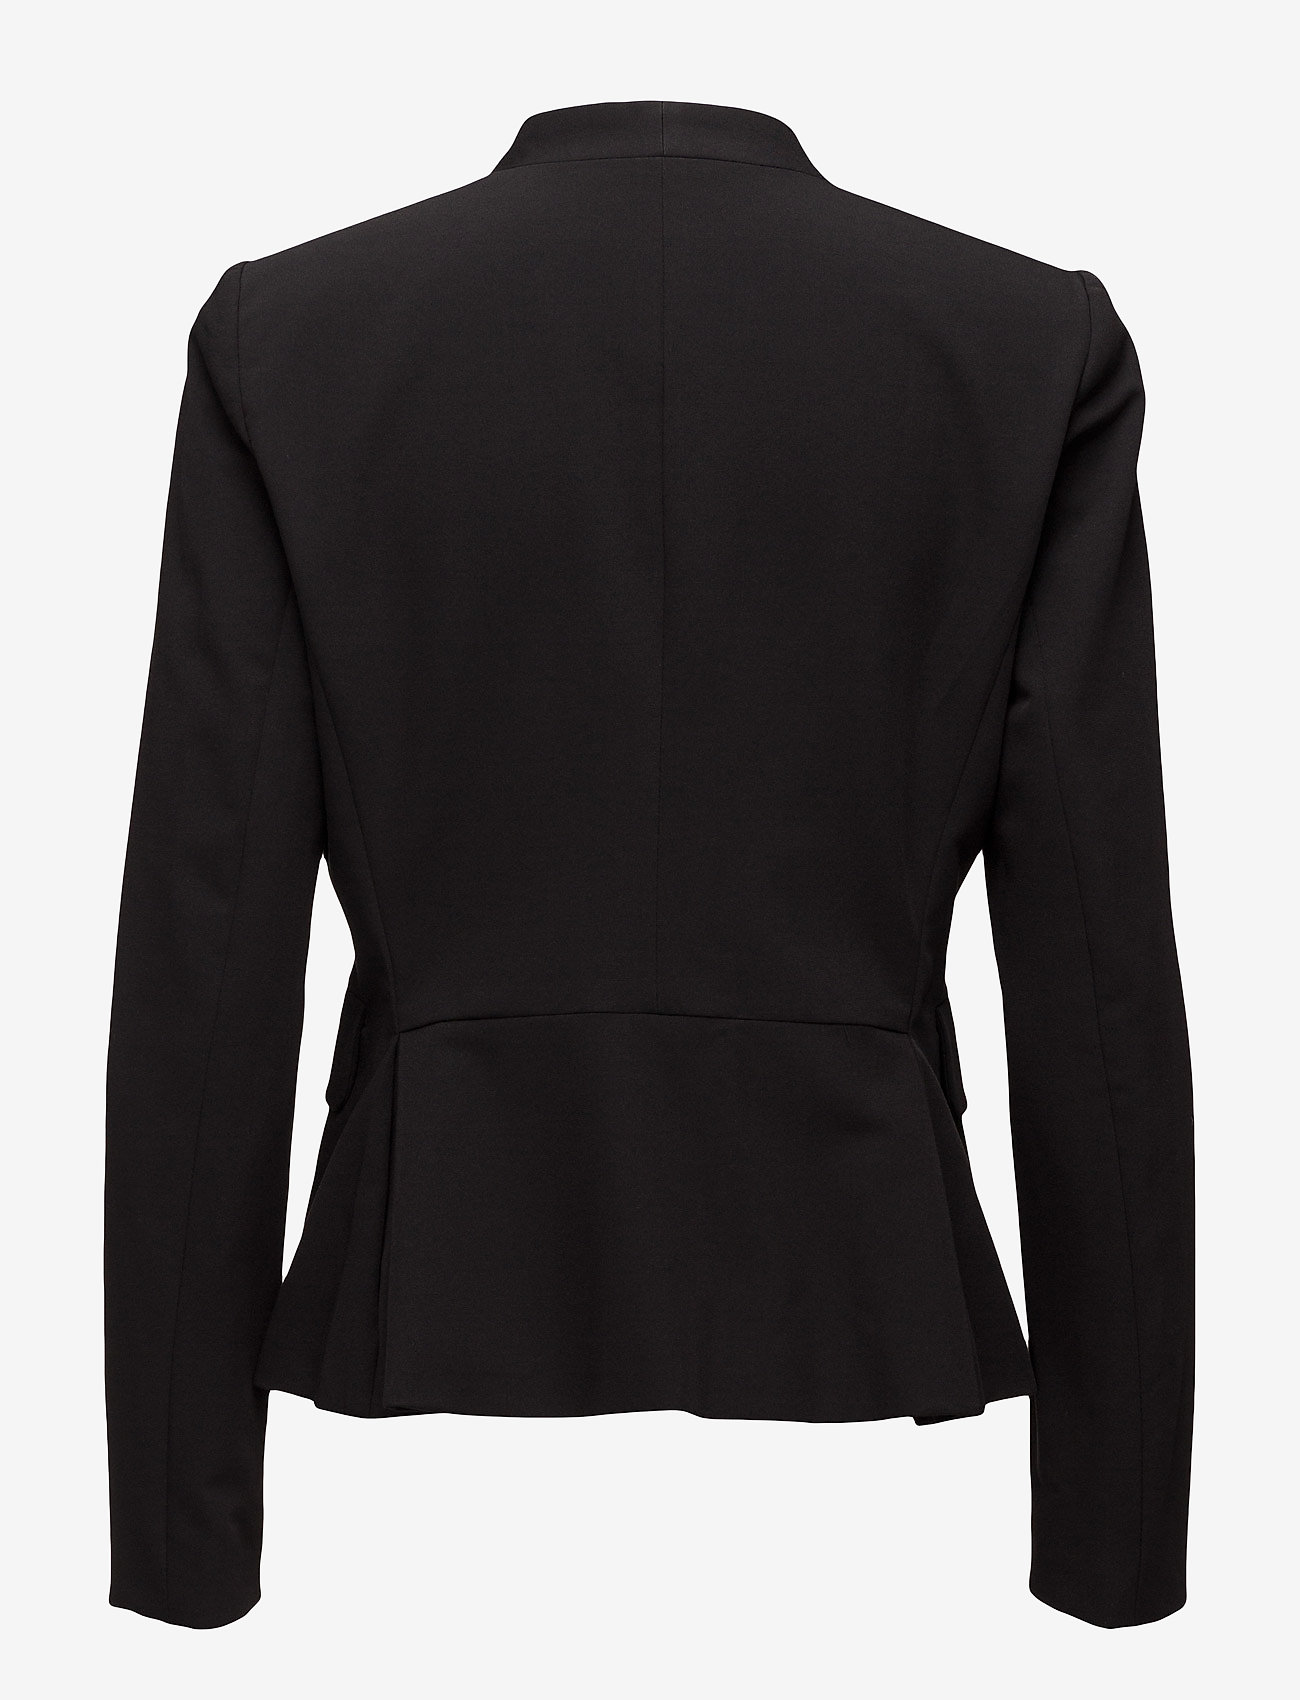 InWear Leigh Blazer - Blazere BLACK - Dameklær Spesialtilbud